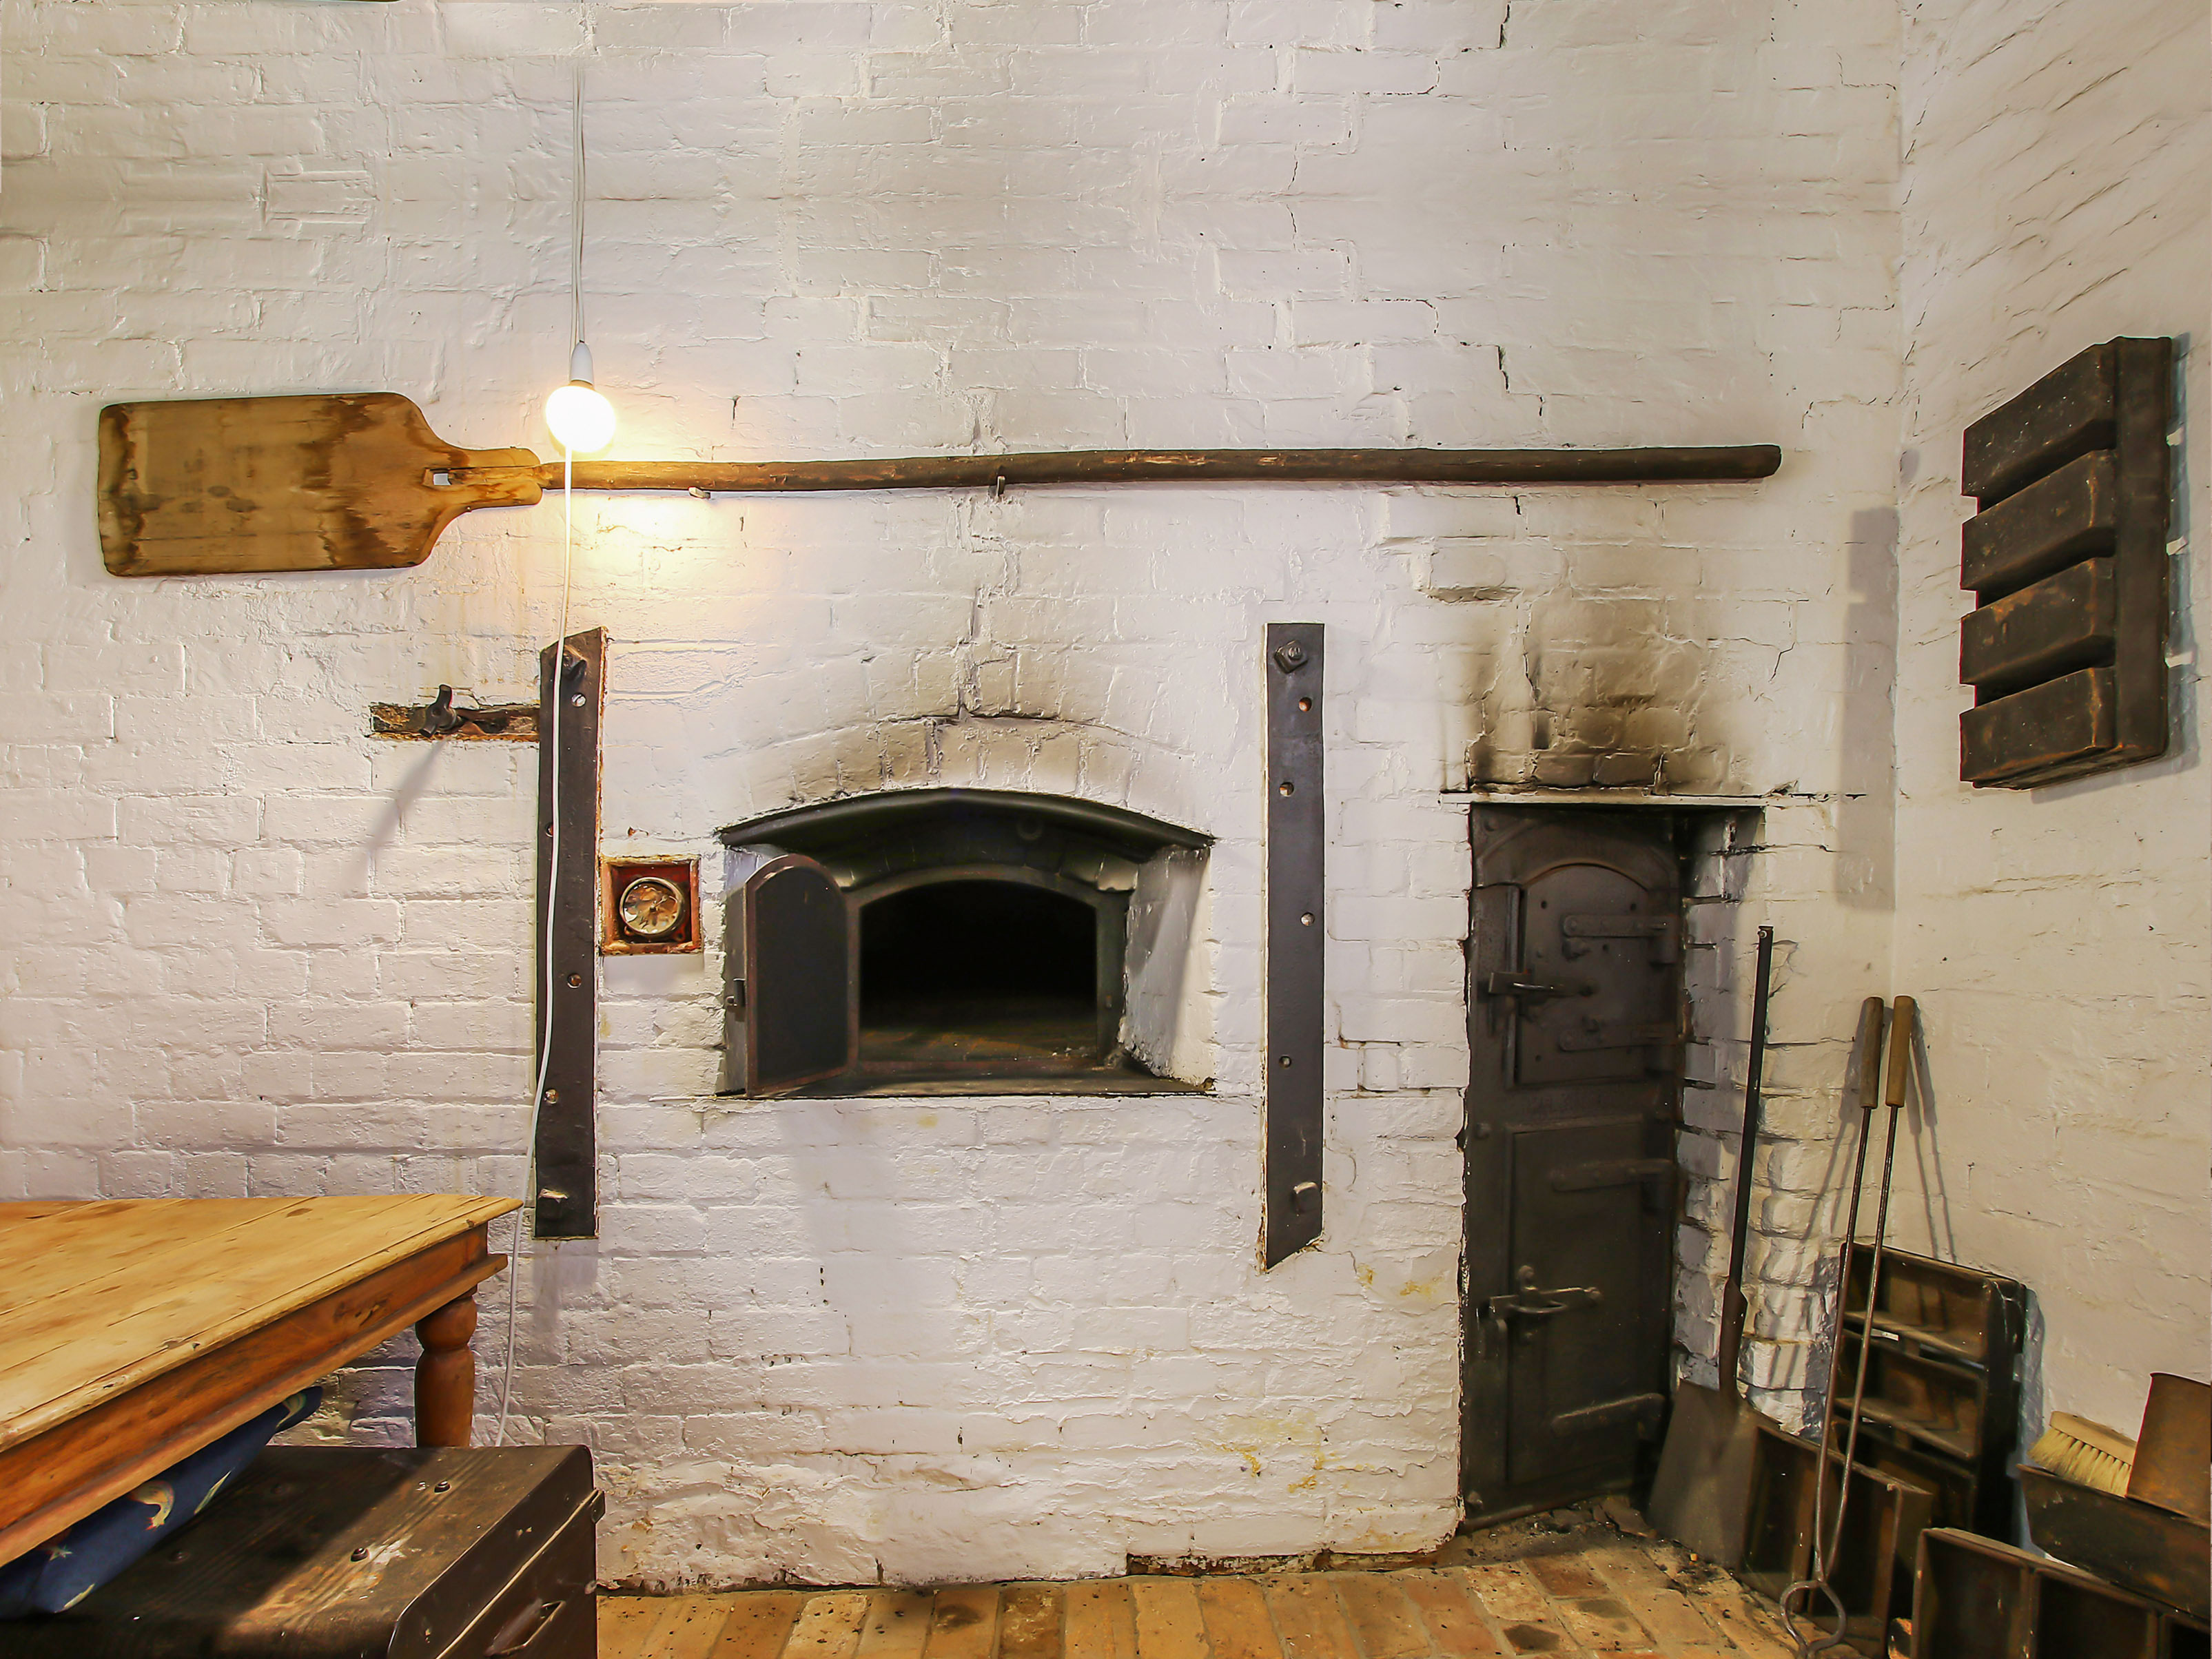 Eldorado's Scotch Oven at Baker's Cottage